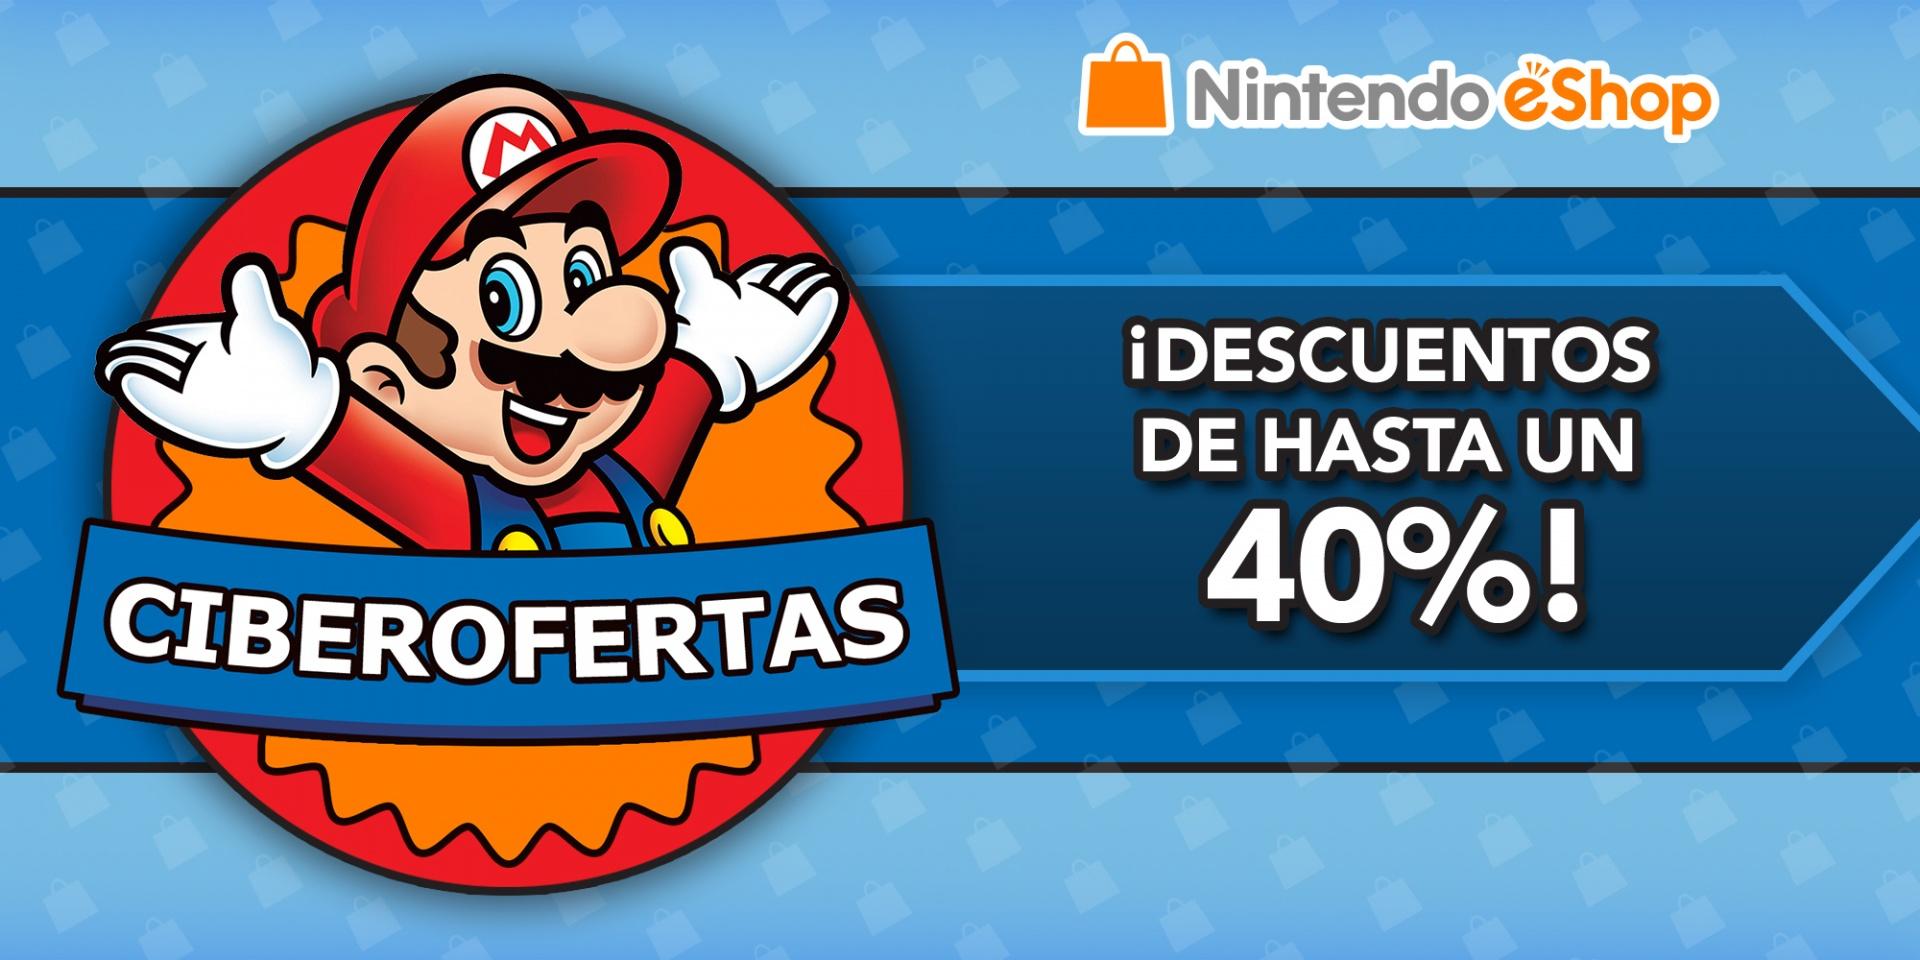 Nintendo eshop: Black Friday